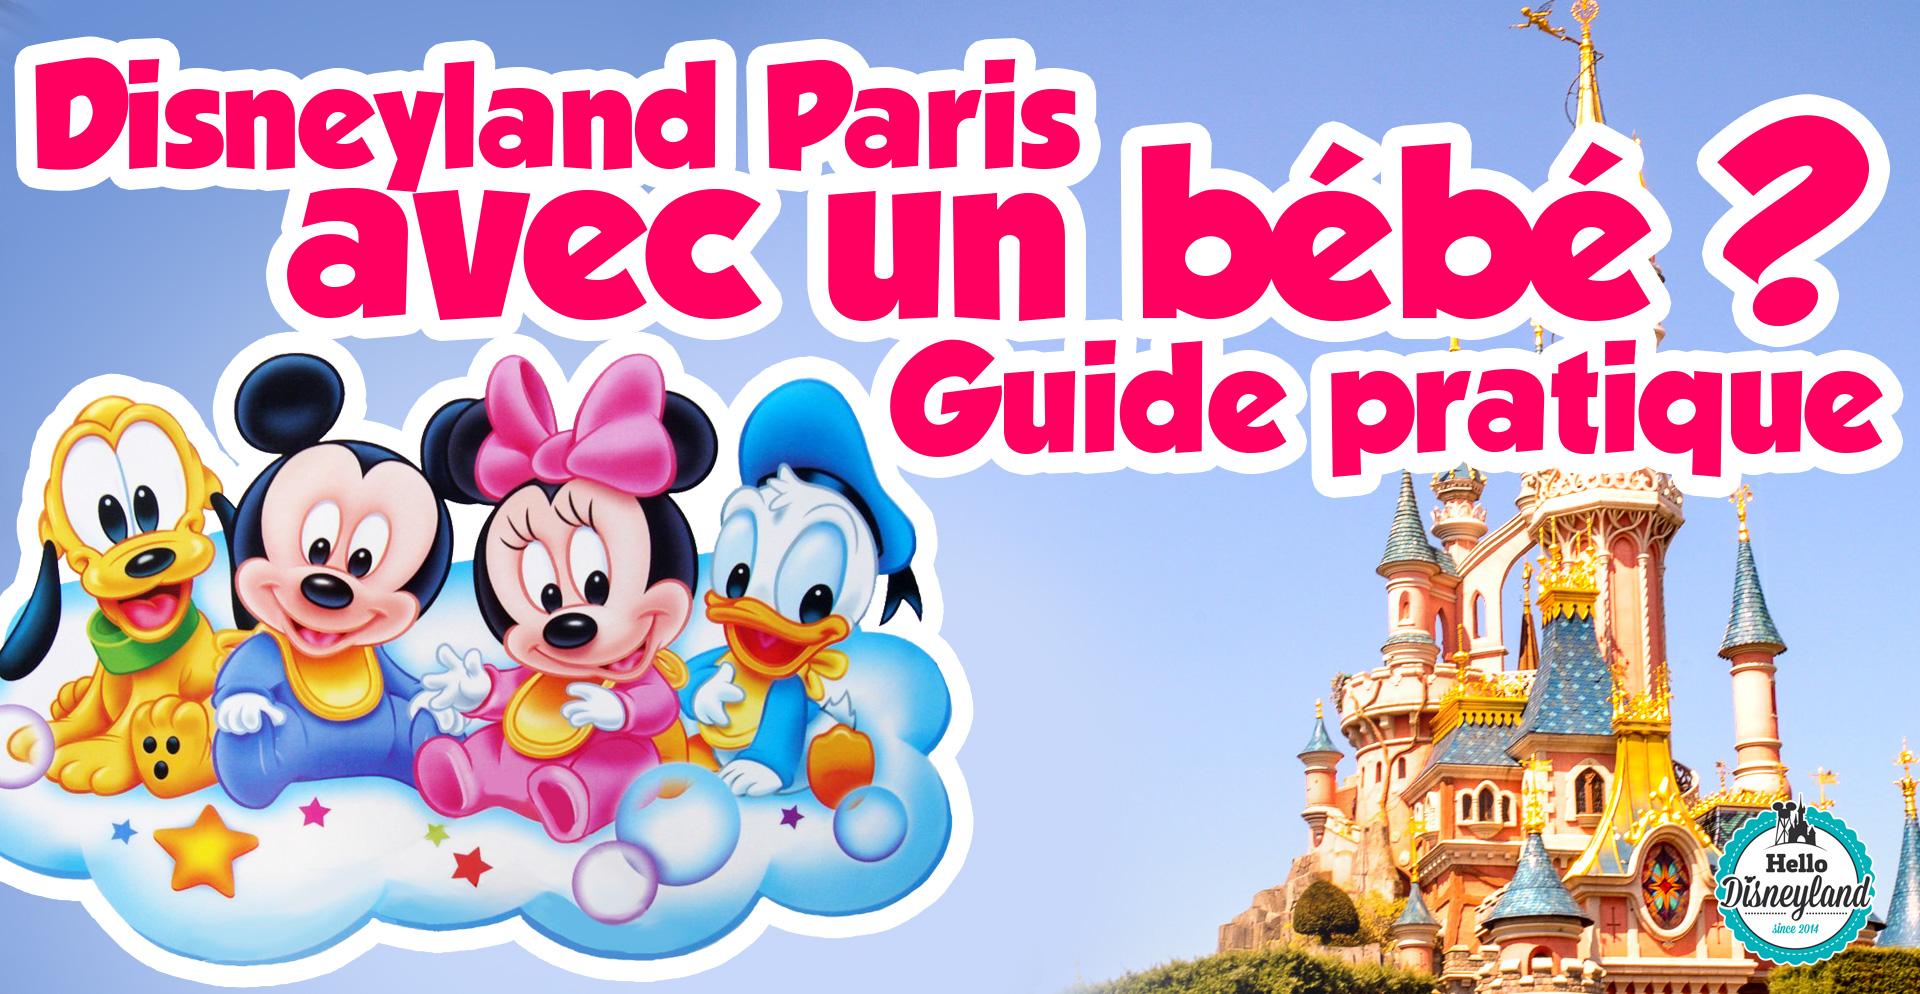 Disneyland Paris avec un bébé   infos pratiques - Hello Disneyland e59f83b8964